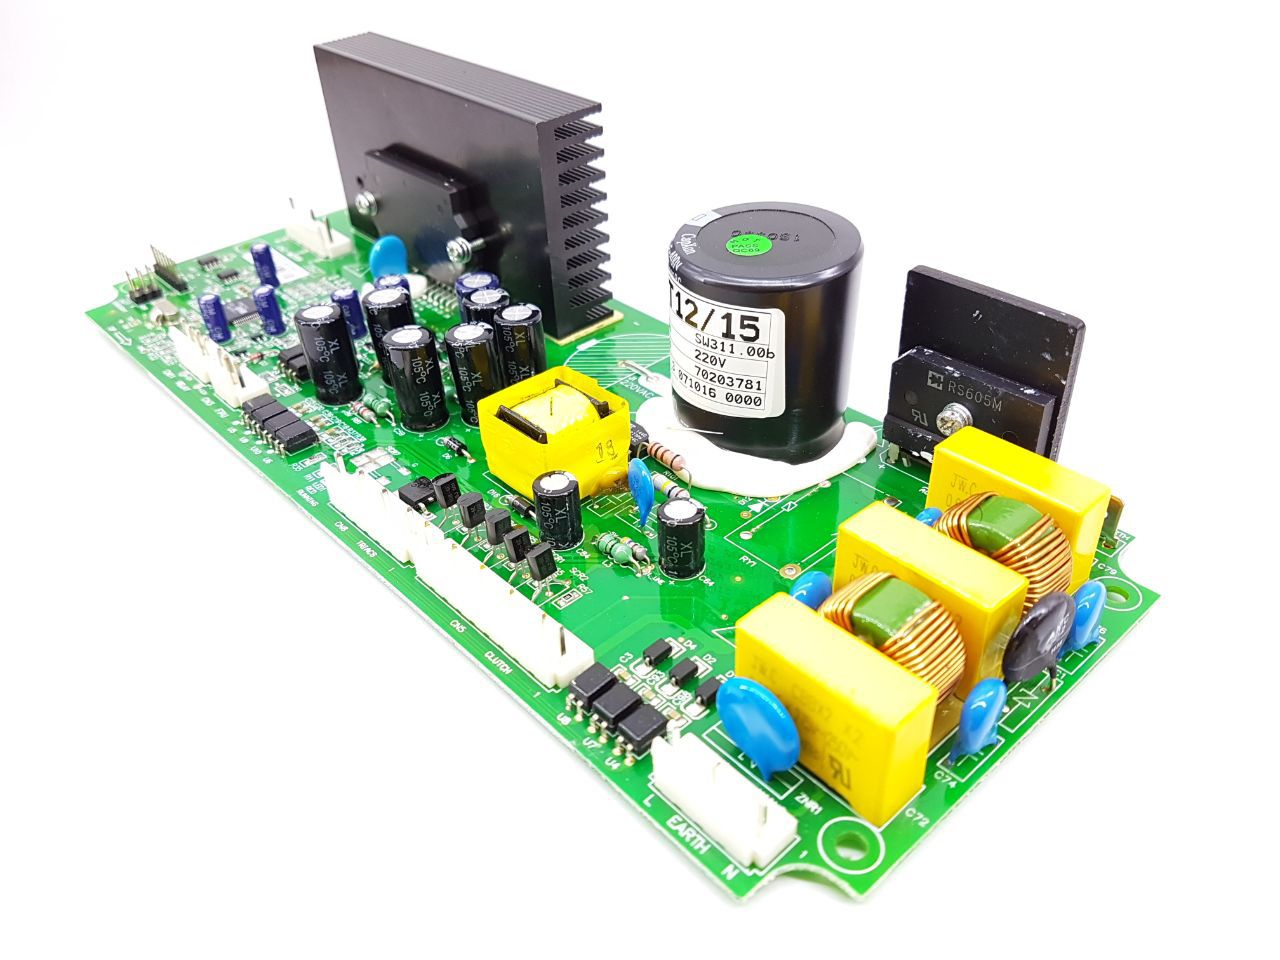 Placa Eletrônica Electrolux Lst12 Lsw15 70203781 Orig. 220v